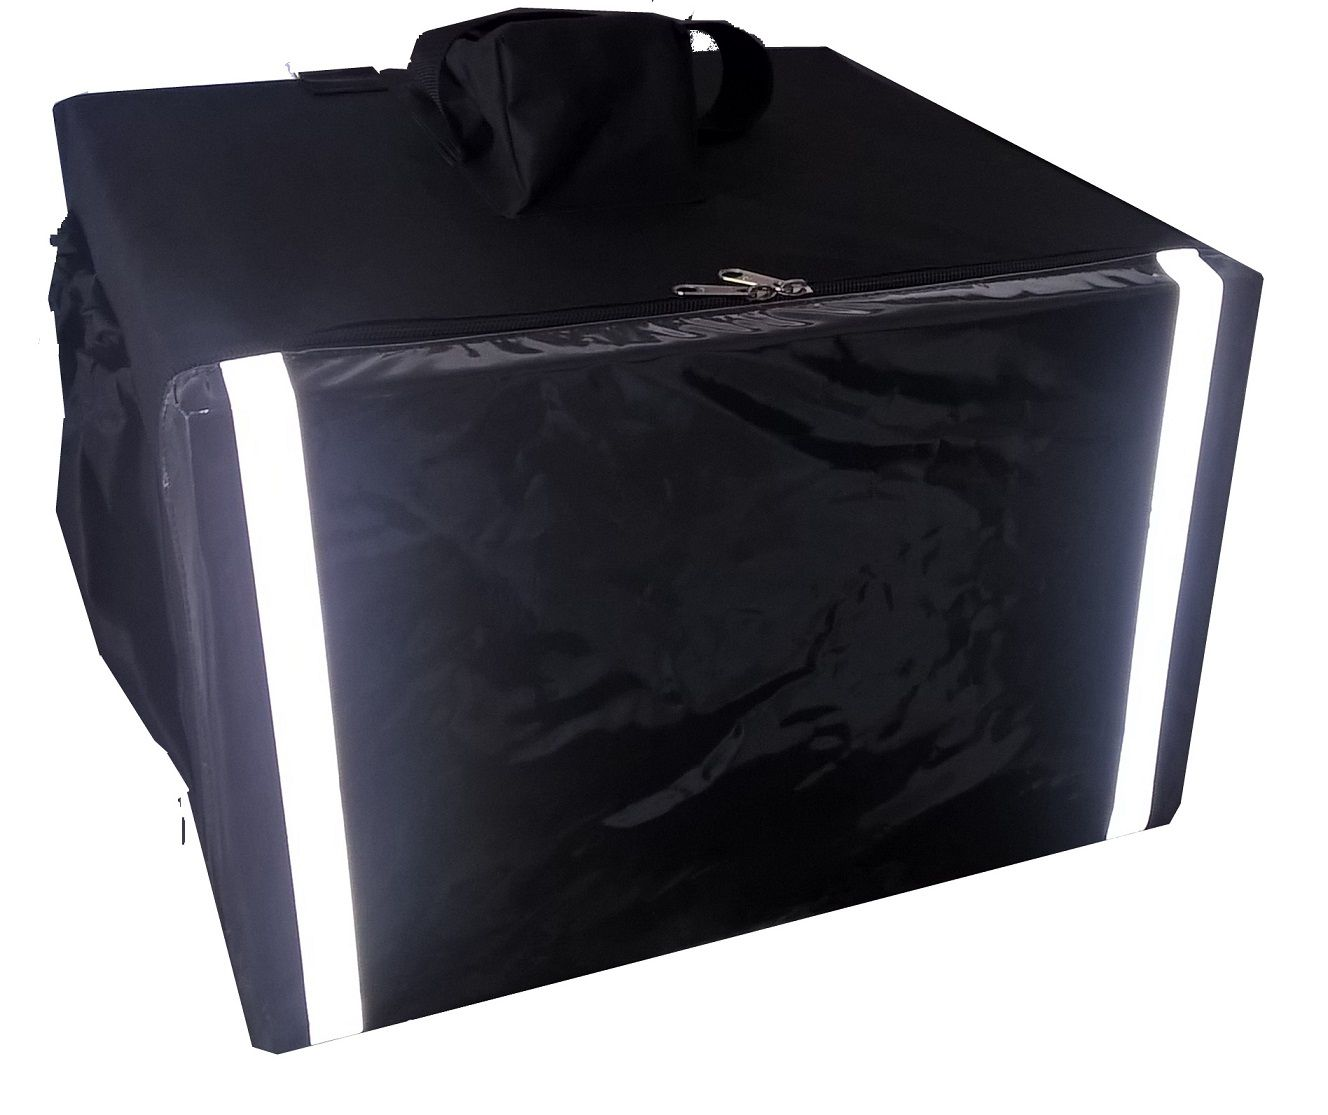 Bag Bolsa Mochila Para Motoboy Mais Alta Entrega Até 7 Pizzas de 40cm Térmica Com Caixa de Isopor  - GuerreiroOnline Bolsas e Mochilas para Pizza Lanches Marmitex